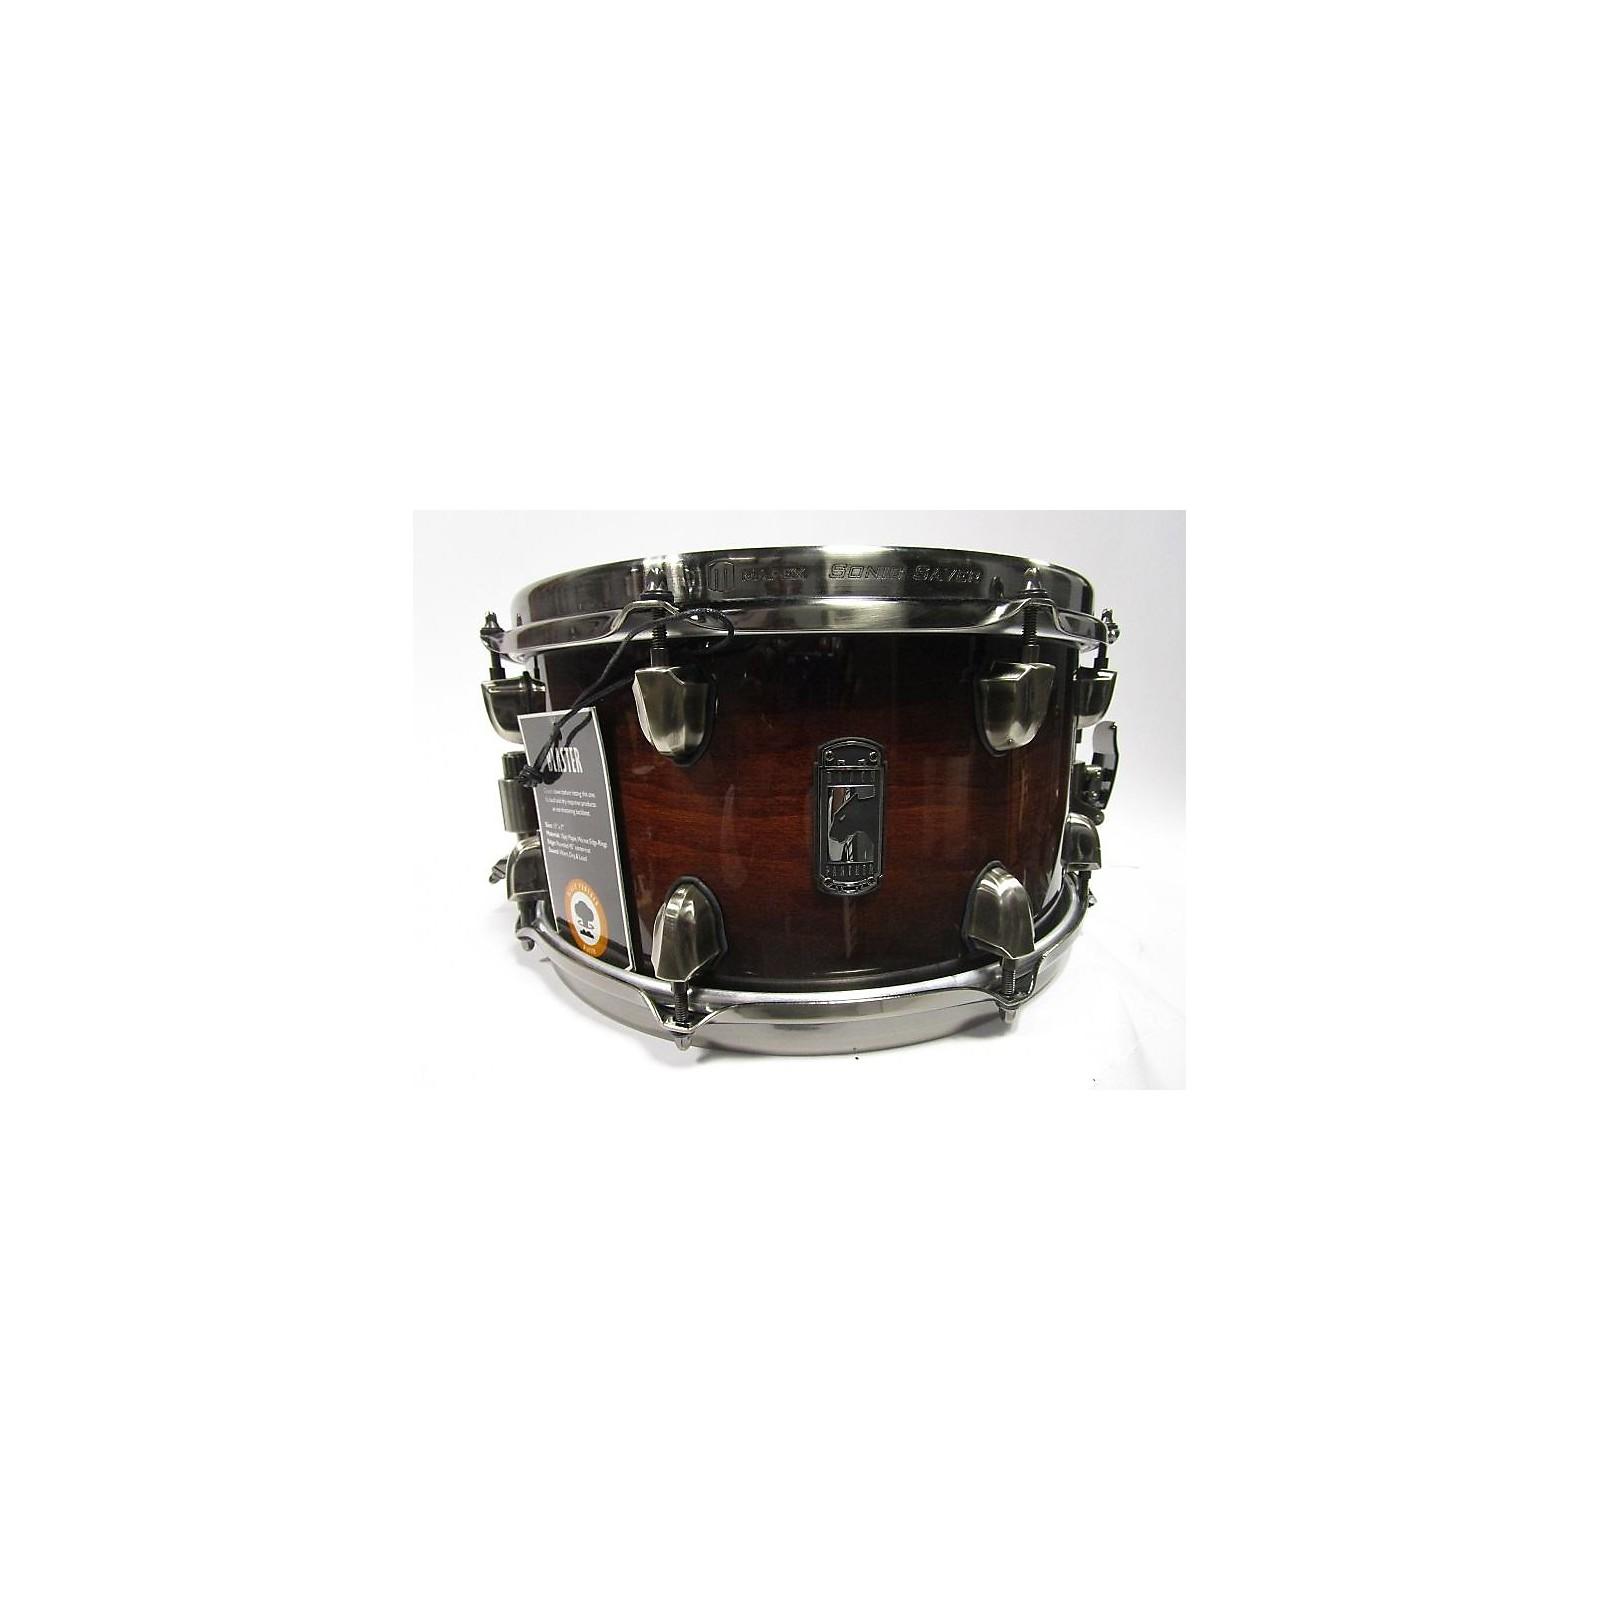 Mapex 13X7 Black Panther Blaster Snare Drum